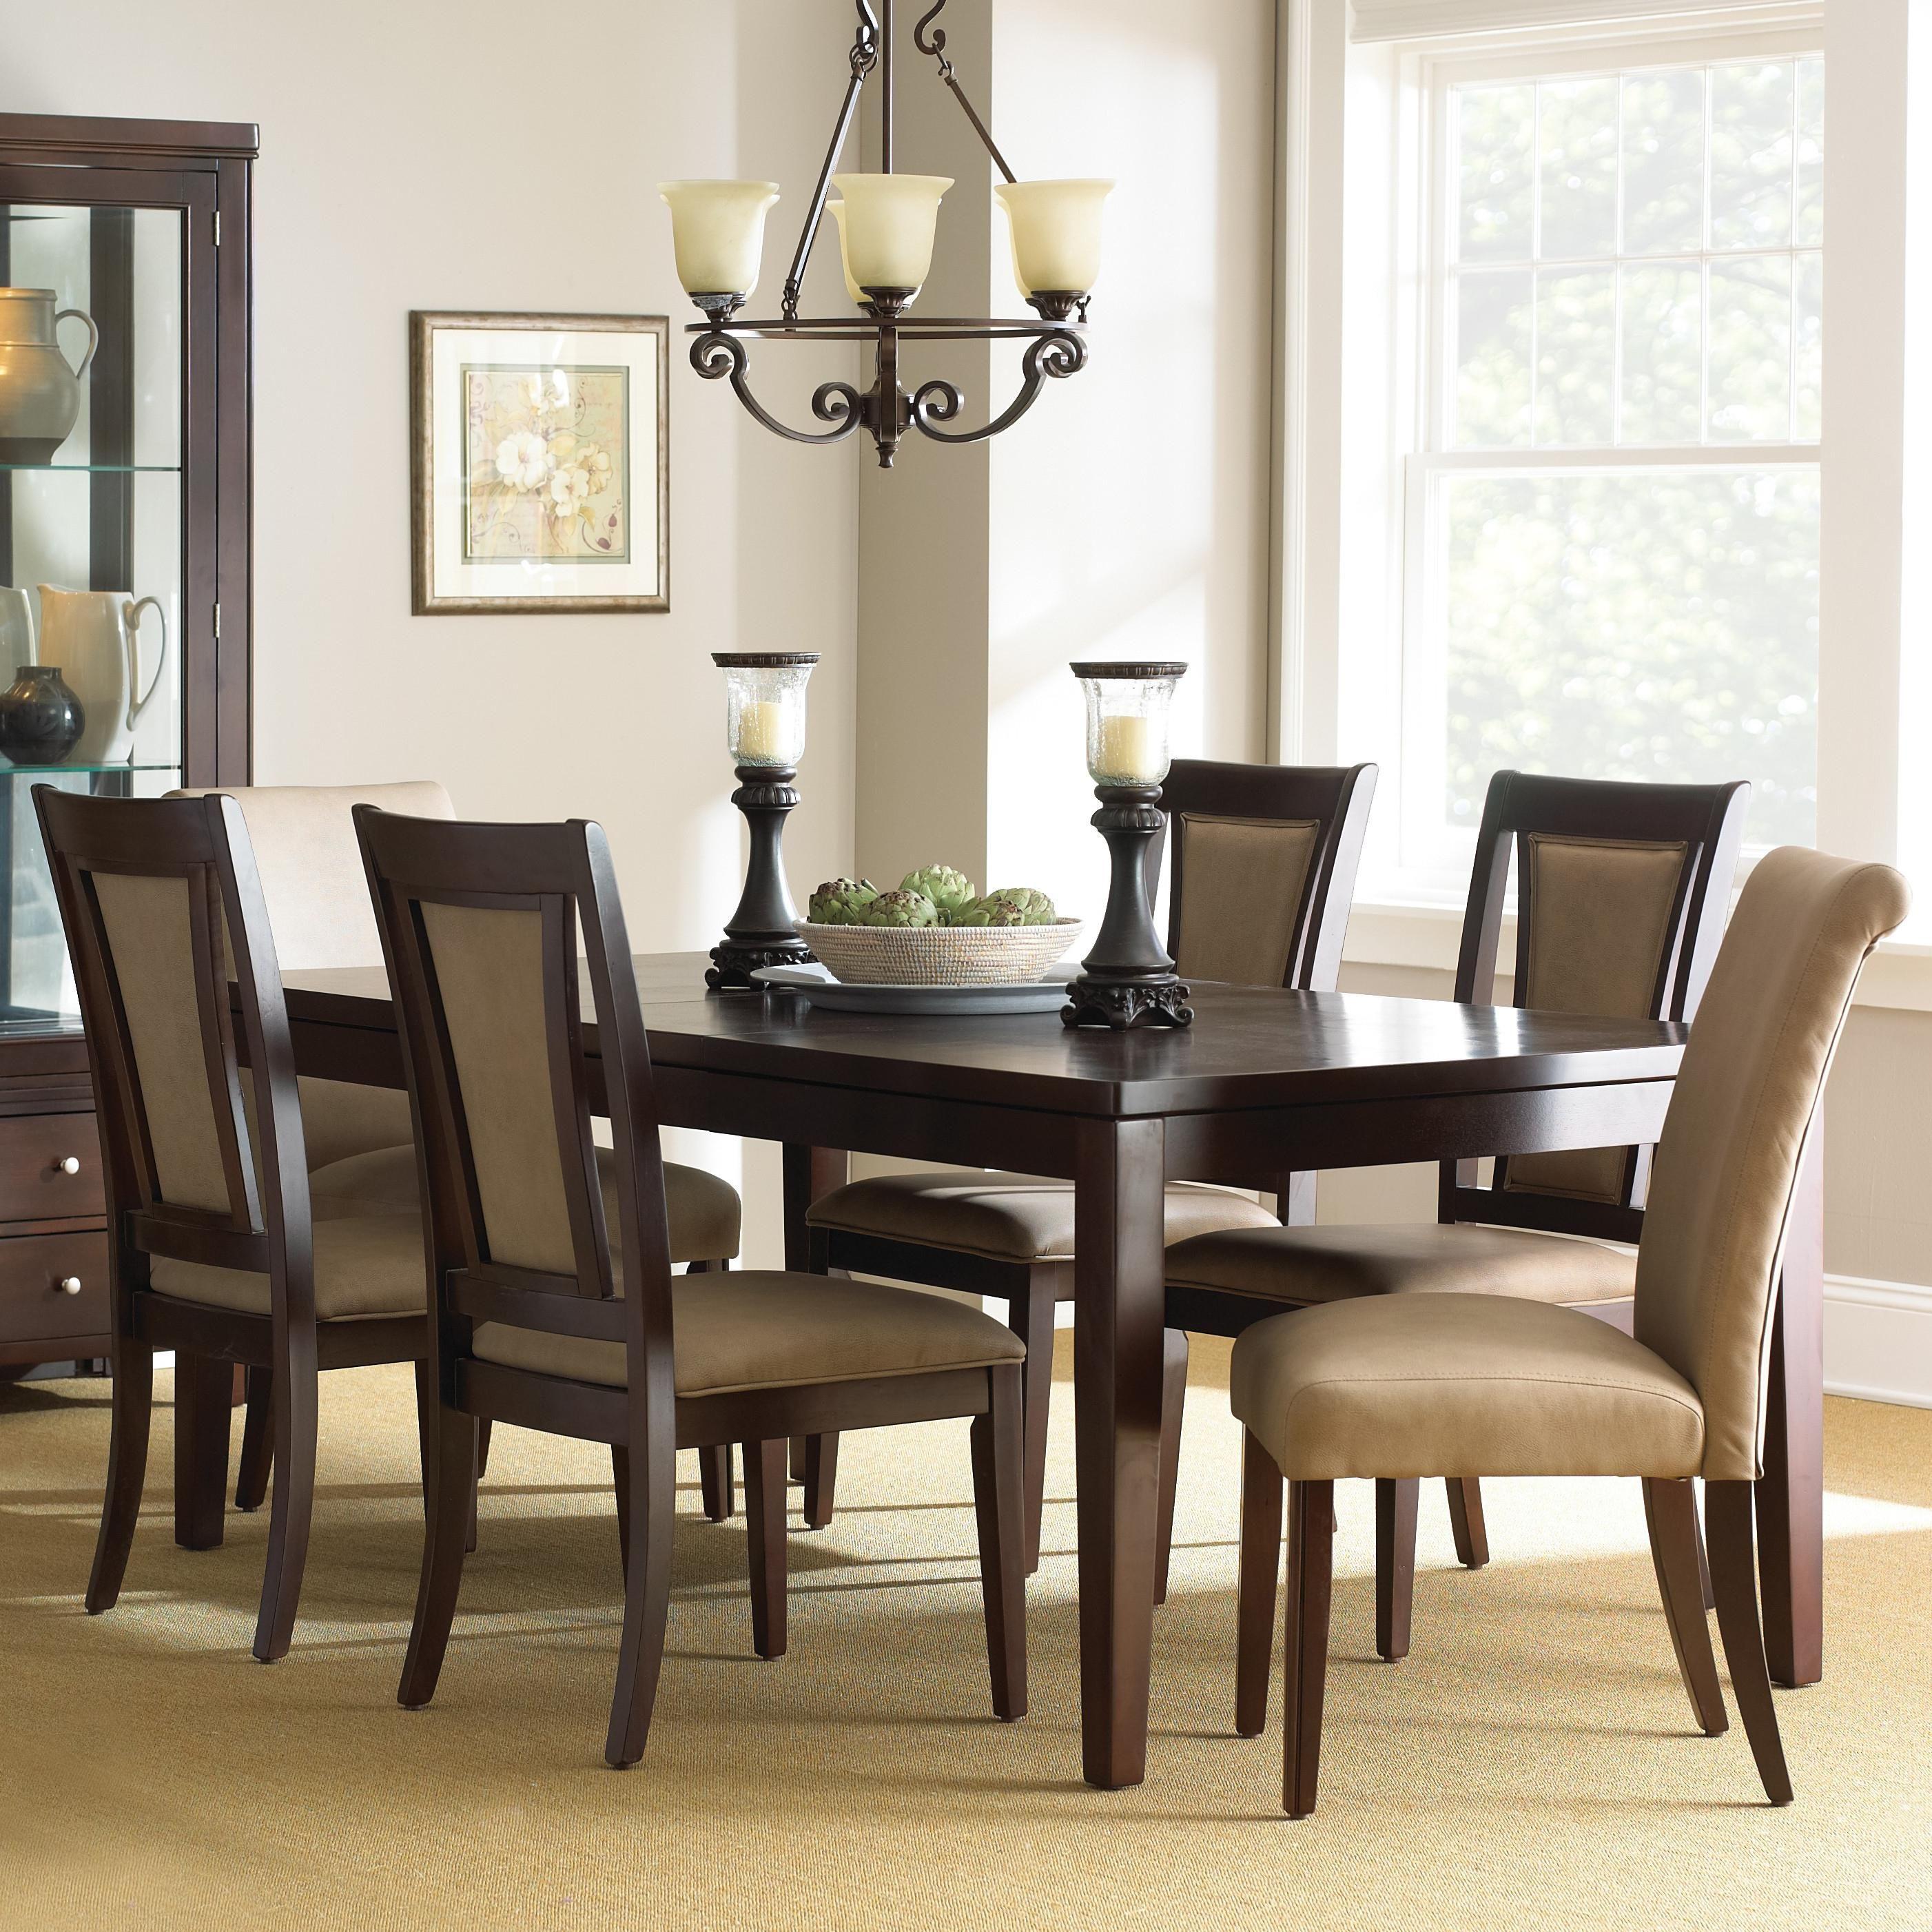 wilson 7 piece dining set by steve silver furniture dining room furniture sets table. Black Bedroom Furniture Sets. Home Design Ideas